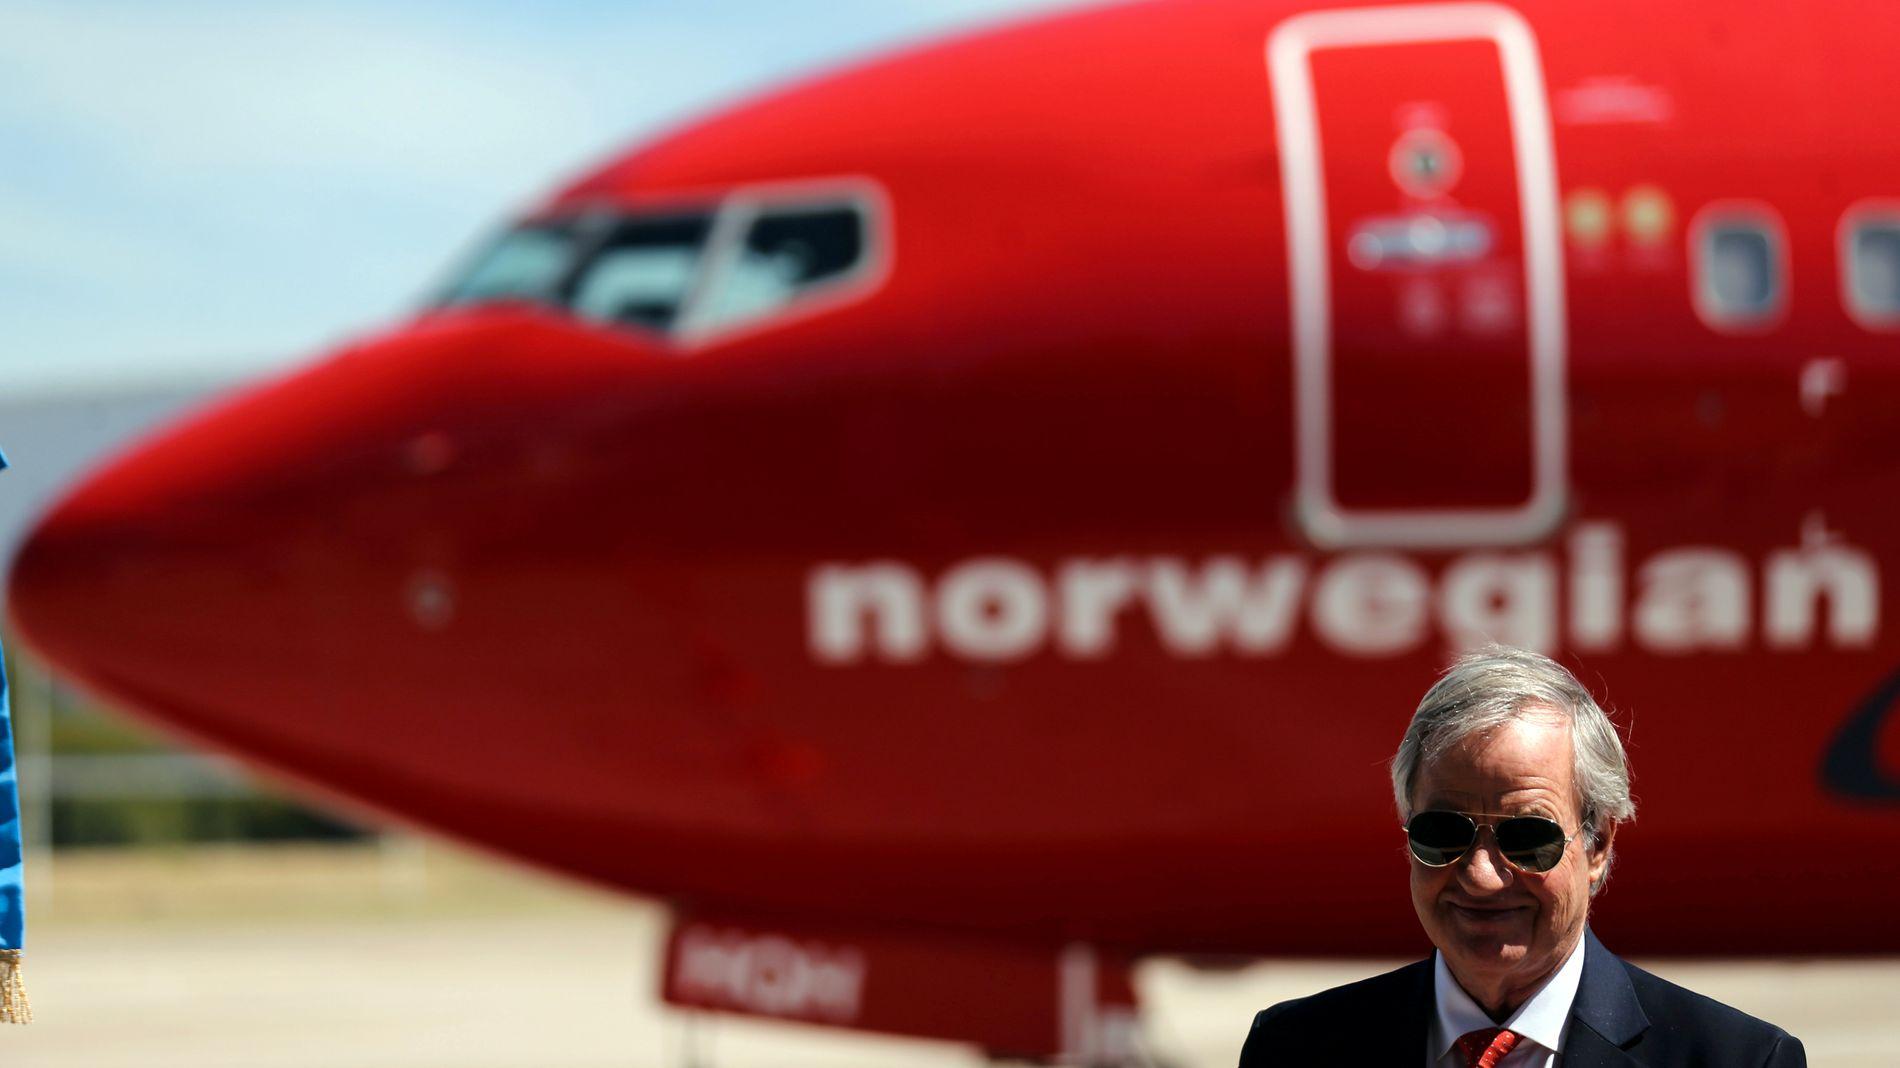 I SOLEN: Norwegian, her ved gründe rog konsernsjef Bjorn Kjos, settes stadig i forbindelse med et IAG-oppkjøp.